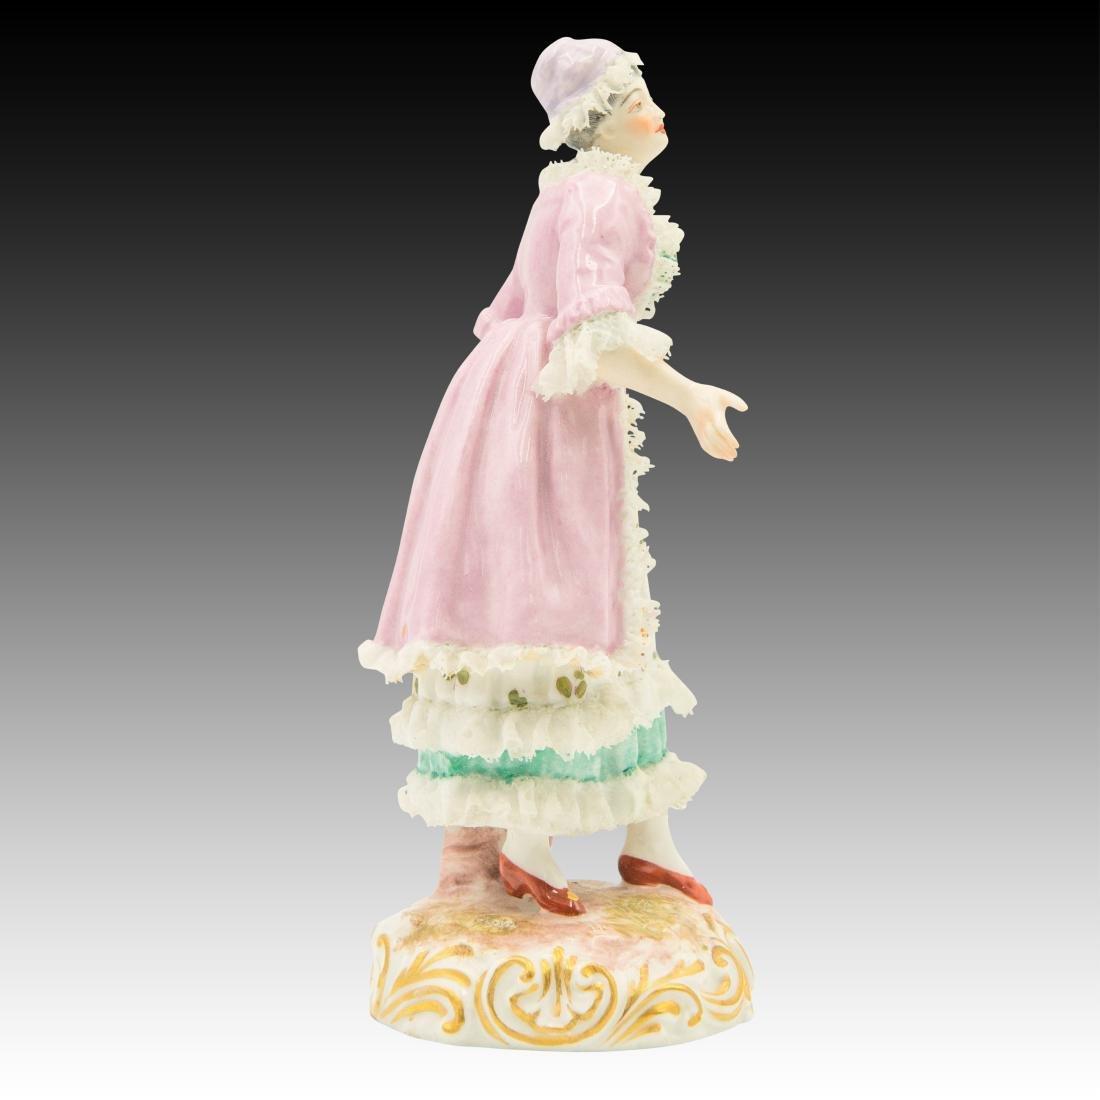 Meissen Maiden Wearing a Lace Dress Figurine - 2